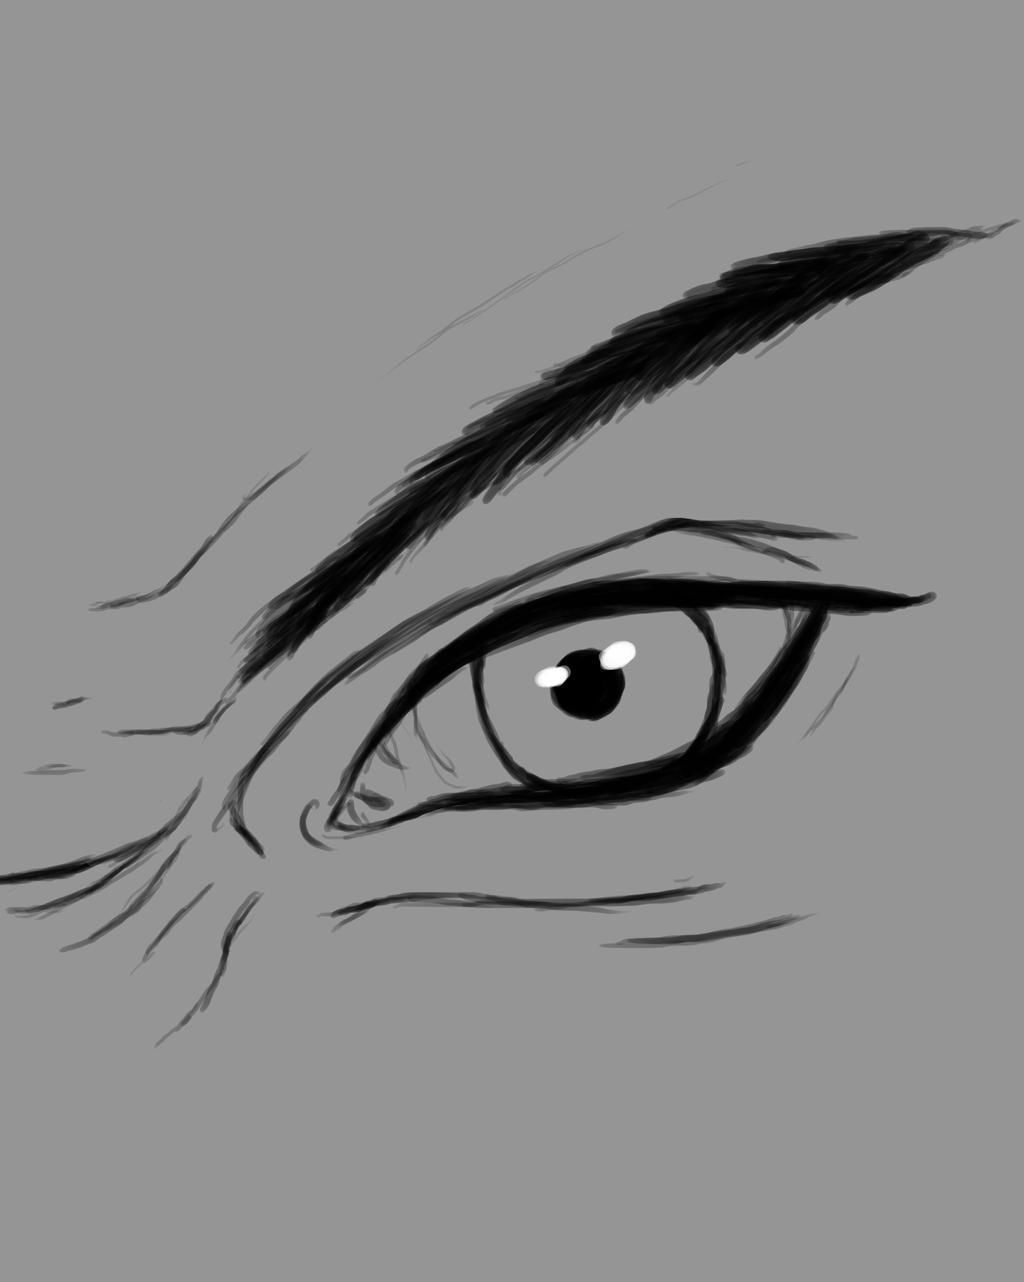 Angry Eye Daily sketch #820 by GothicVampireFreak